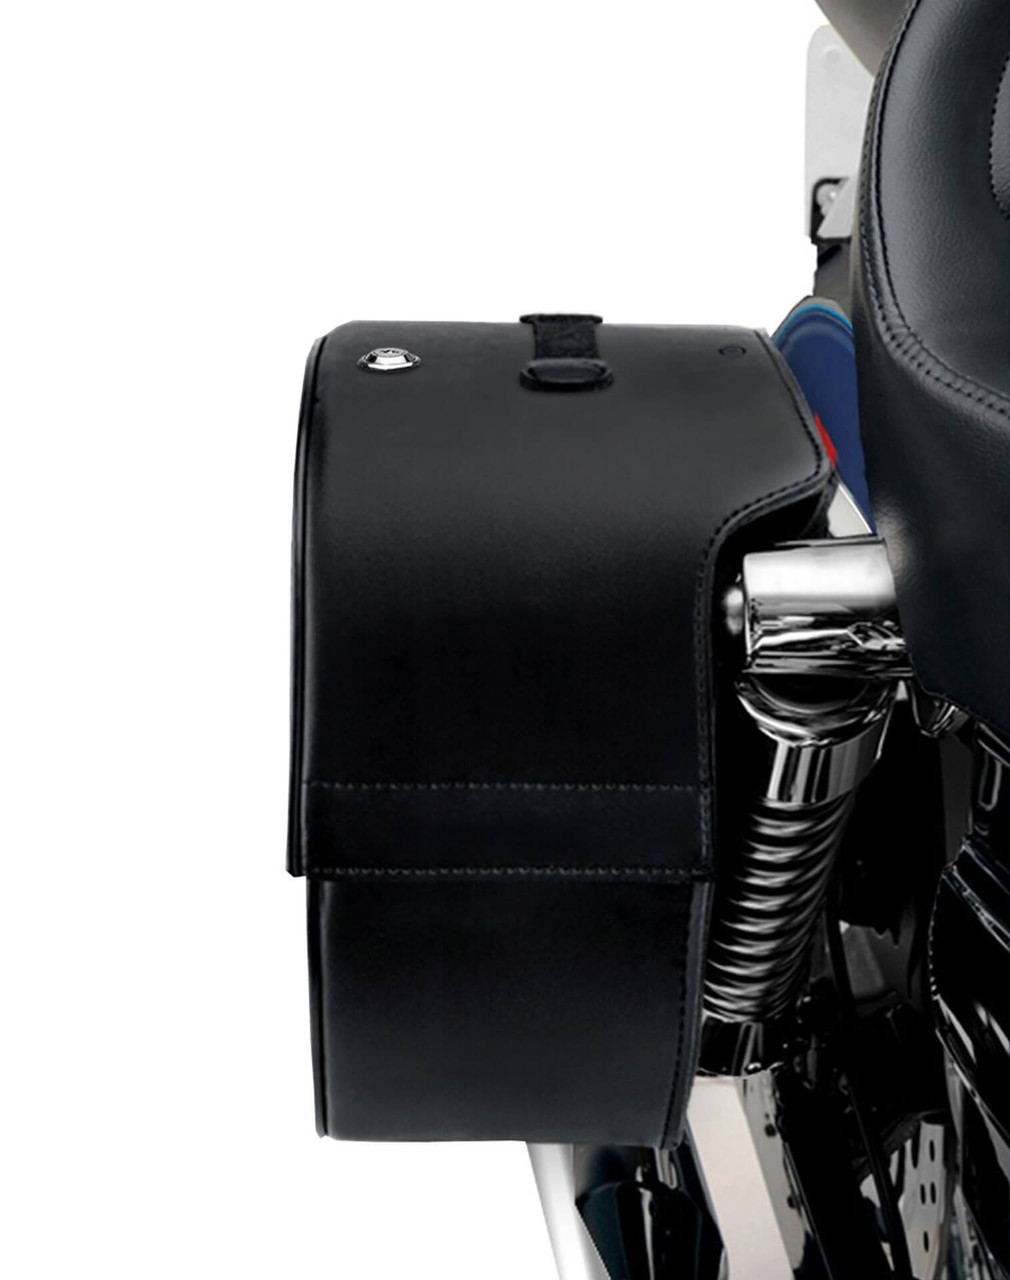 VikingBags Char Spear Medium Shock Cutout Honda Rebel 500 ABS CMX500A Leather Motorcycle Saddlebags Shock Cutout View